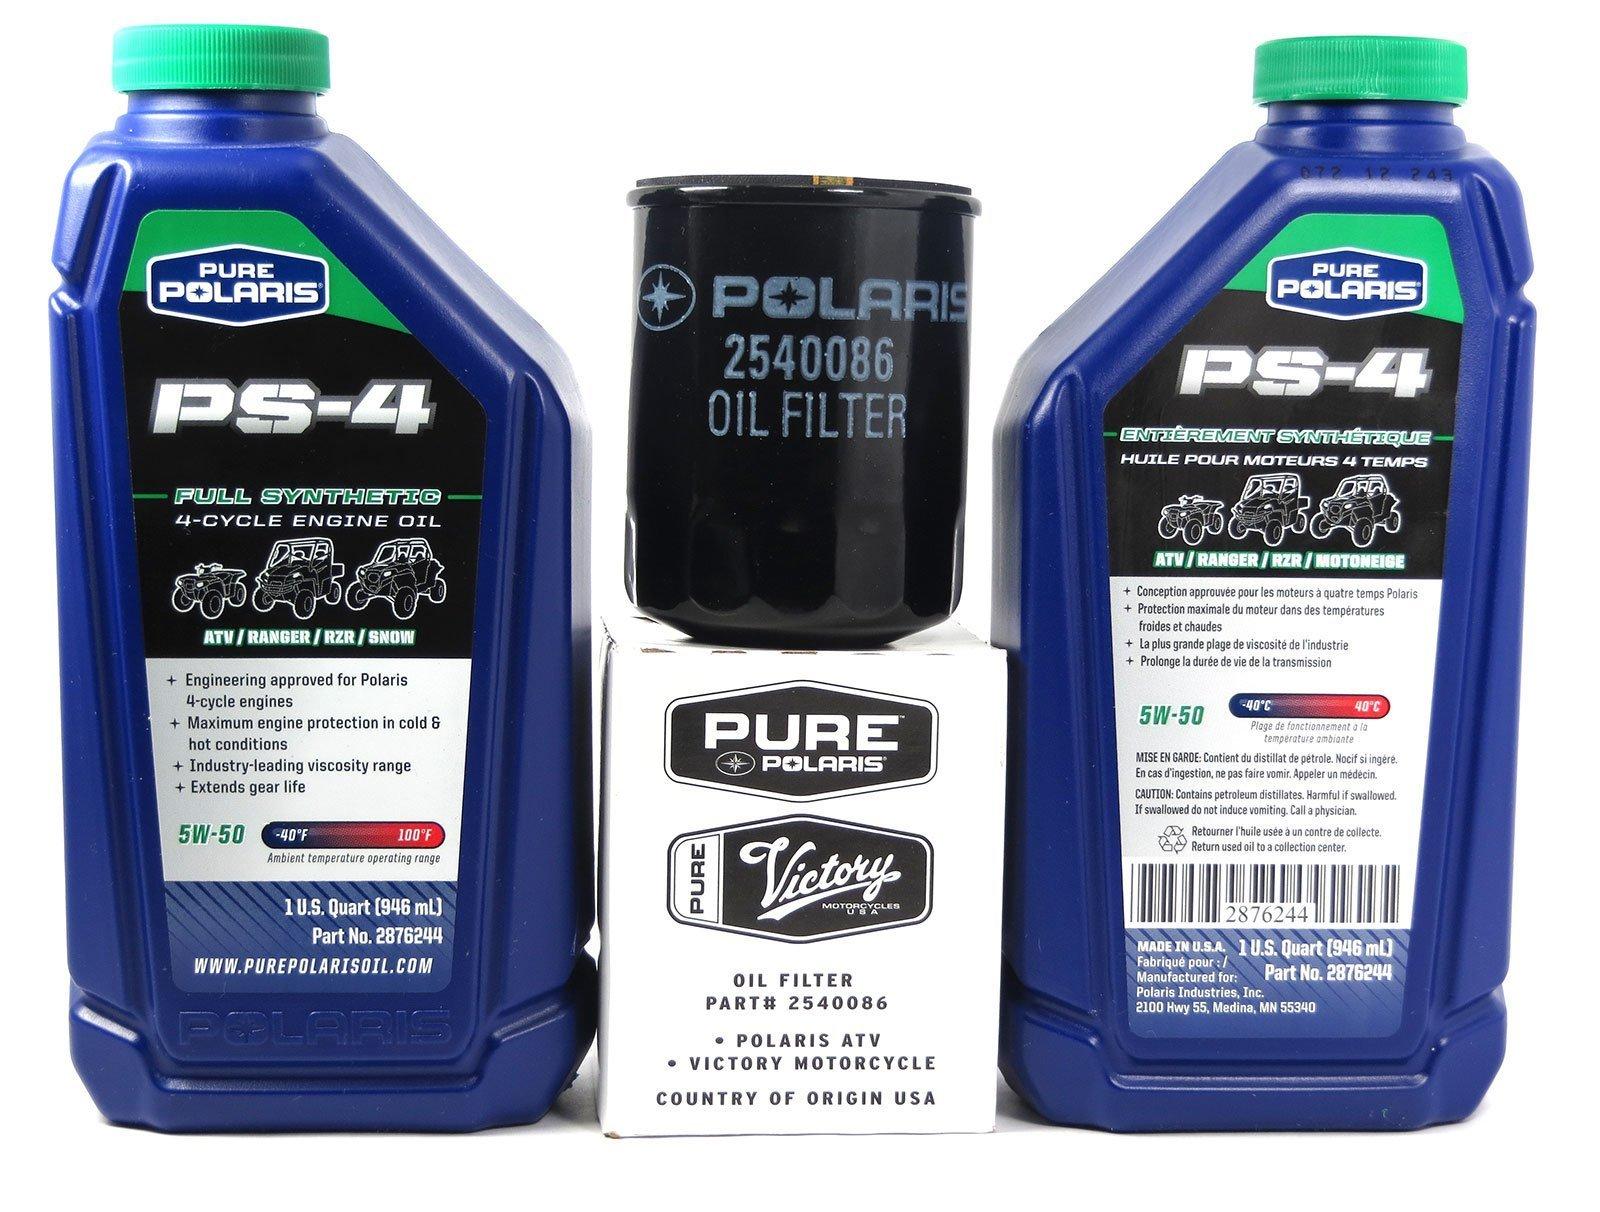 2012 POLARIS RANGER 800 / XP HD POLARIS OIL CHANGE KIT